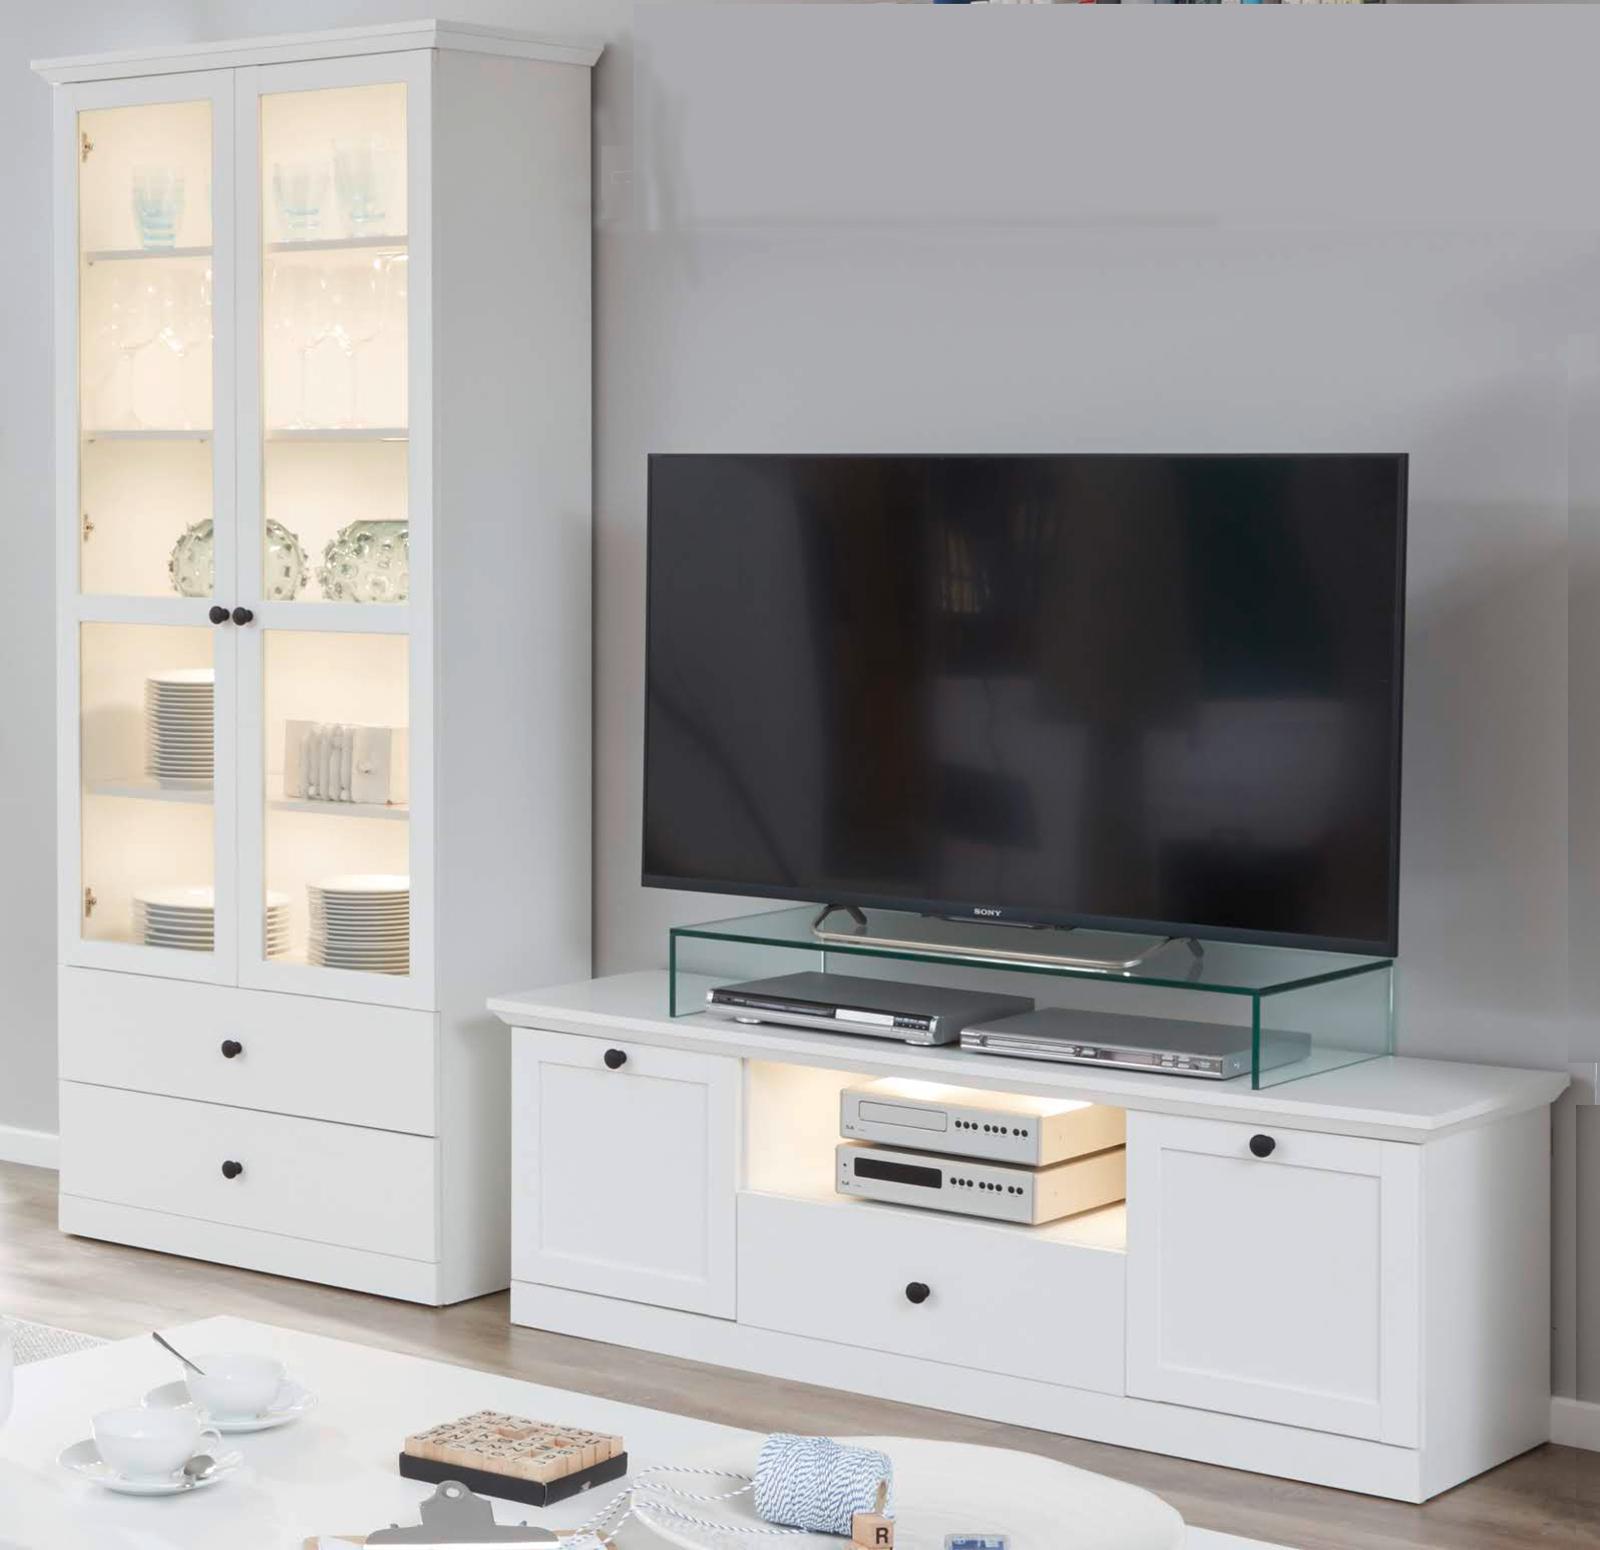 Mobel Wohnwand Schrankwand Set In Weiss Landhaus Tv Lowboard